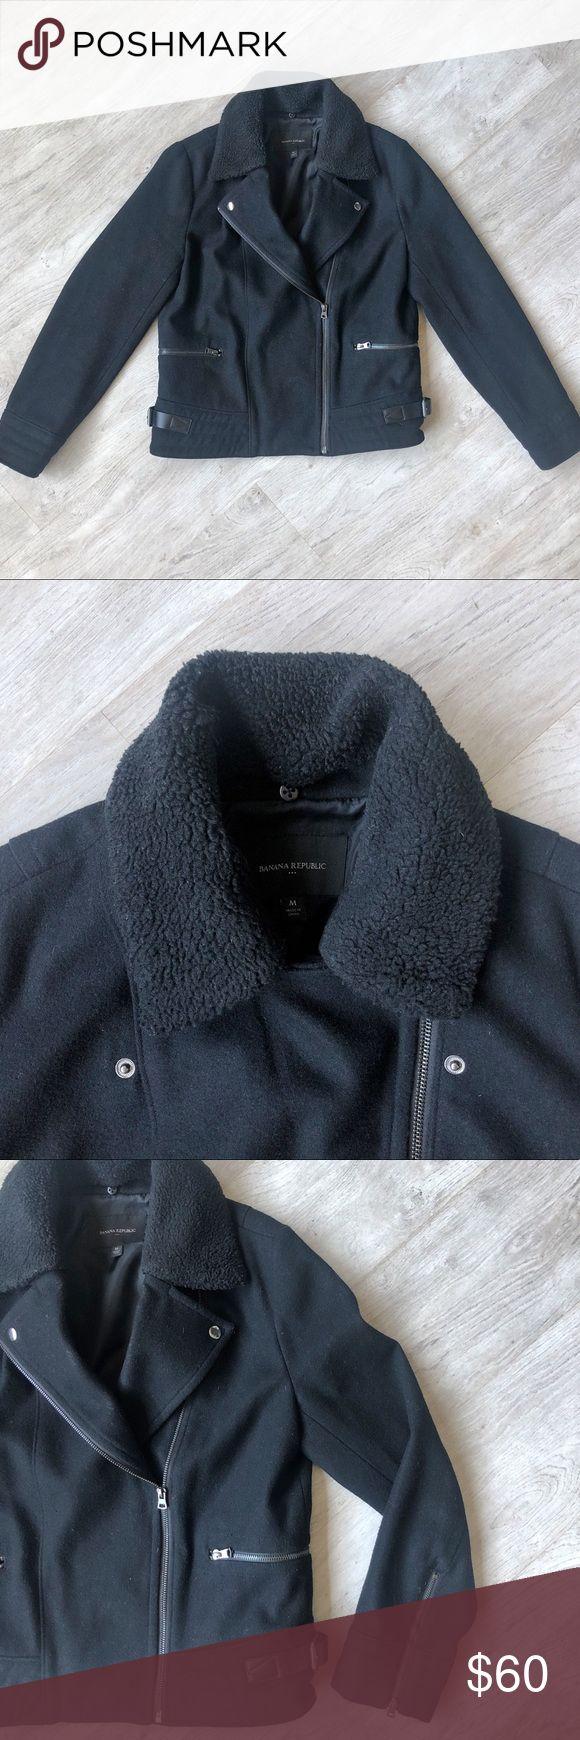 Sherpa Collar Wool Moto Jacket Moto jacket, Jackets